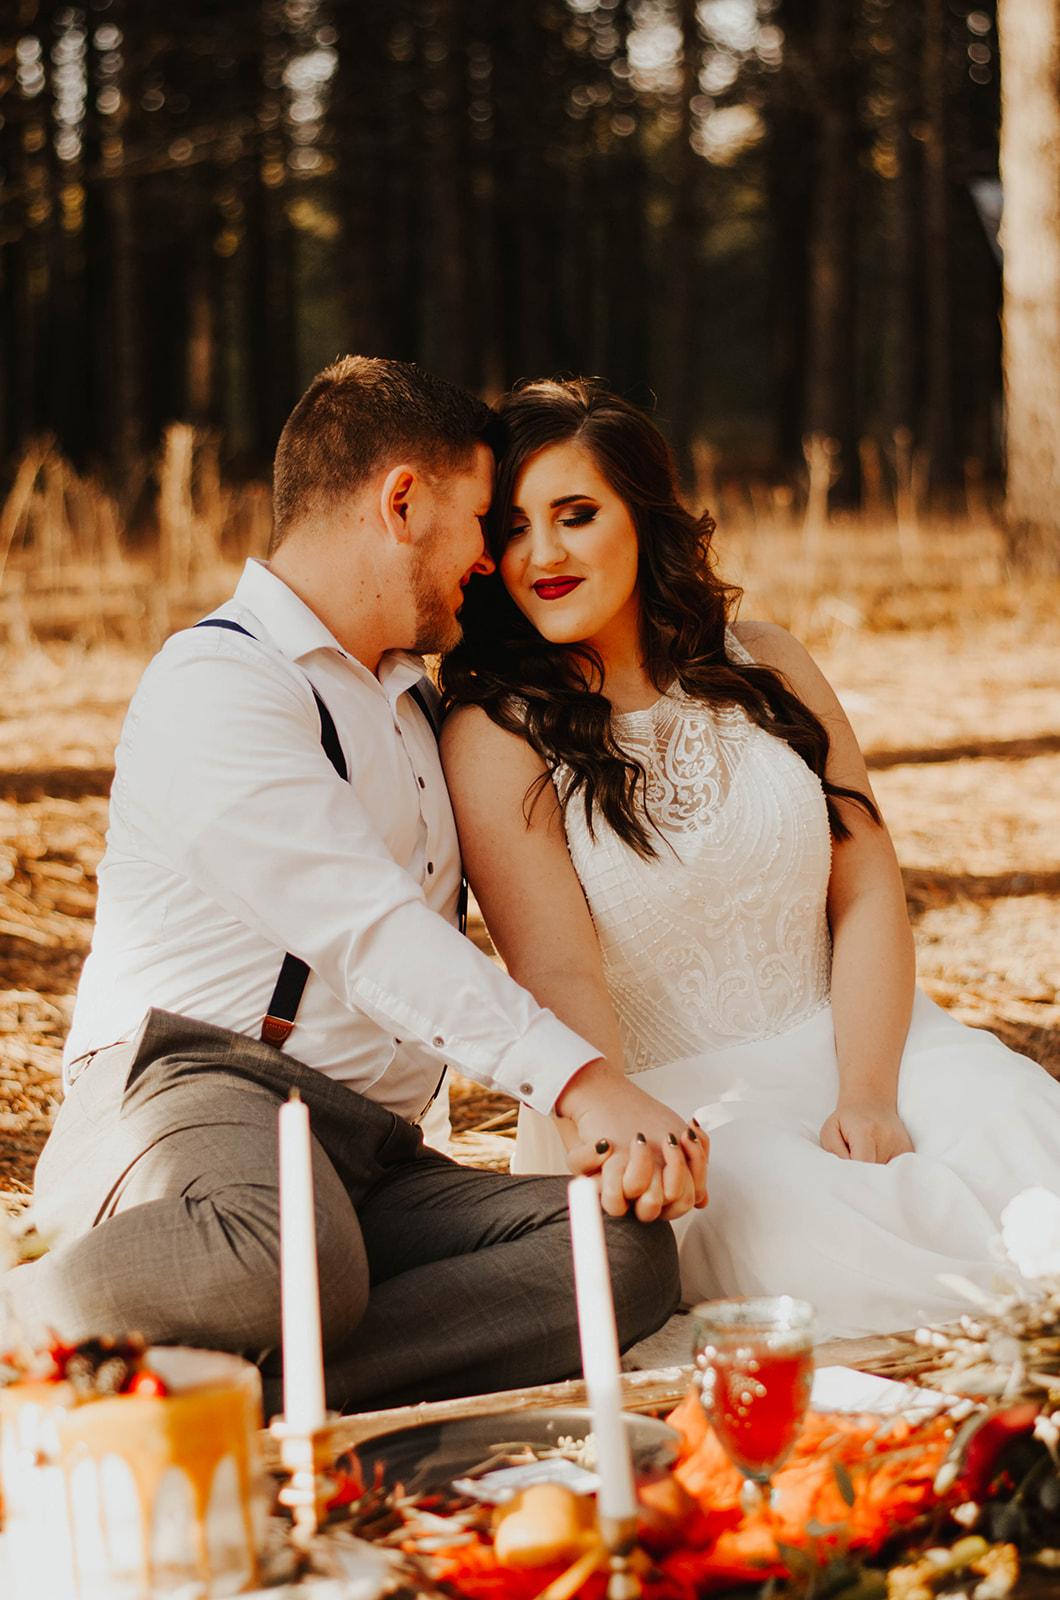 bride and groom at elopement dinner wedding spokane